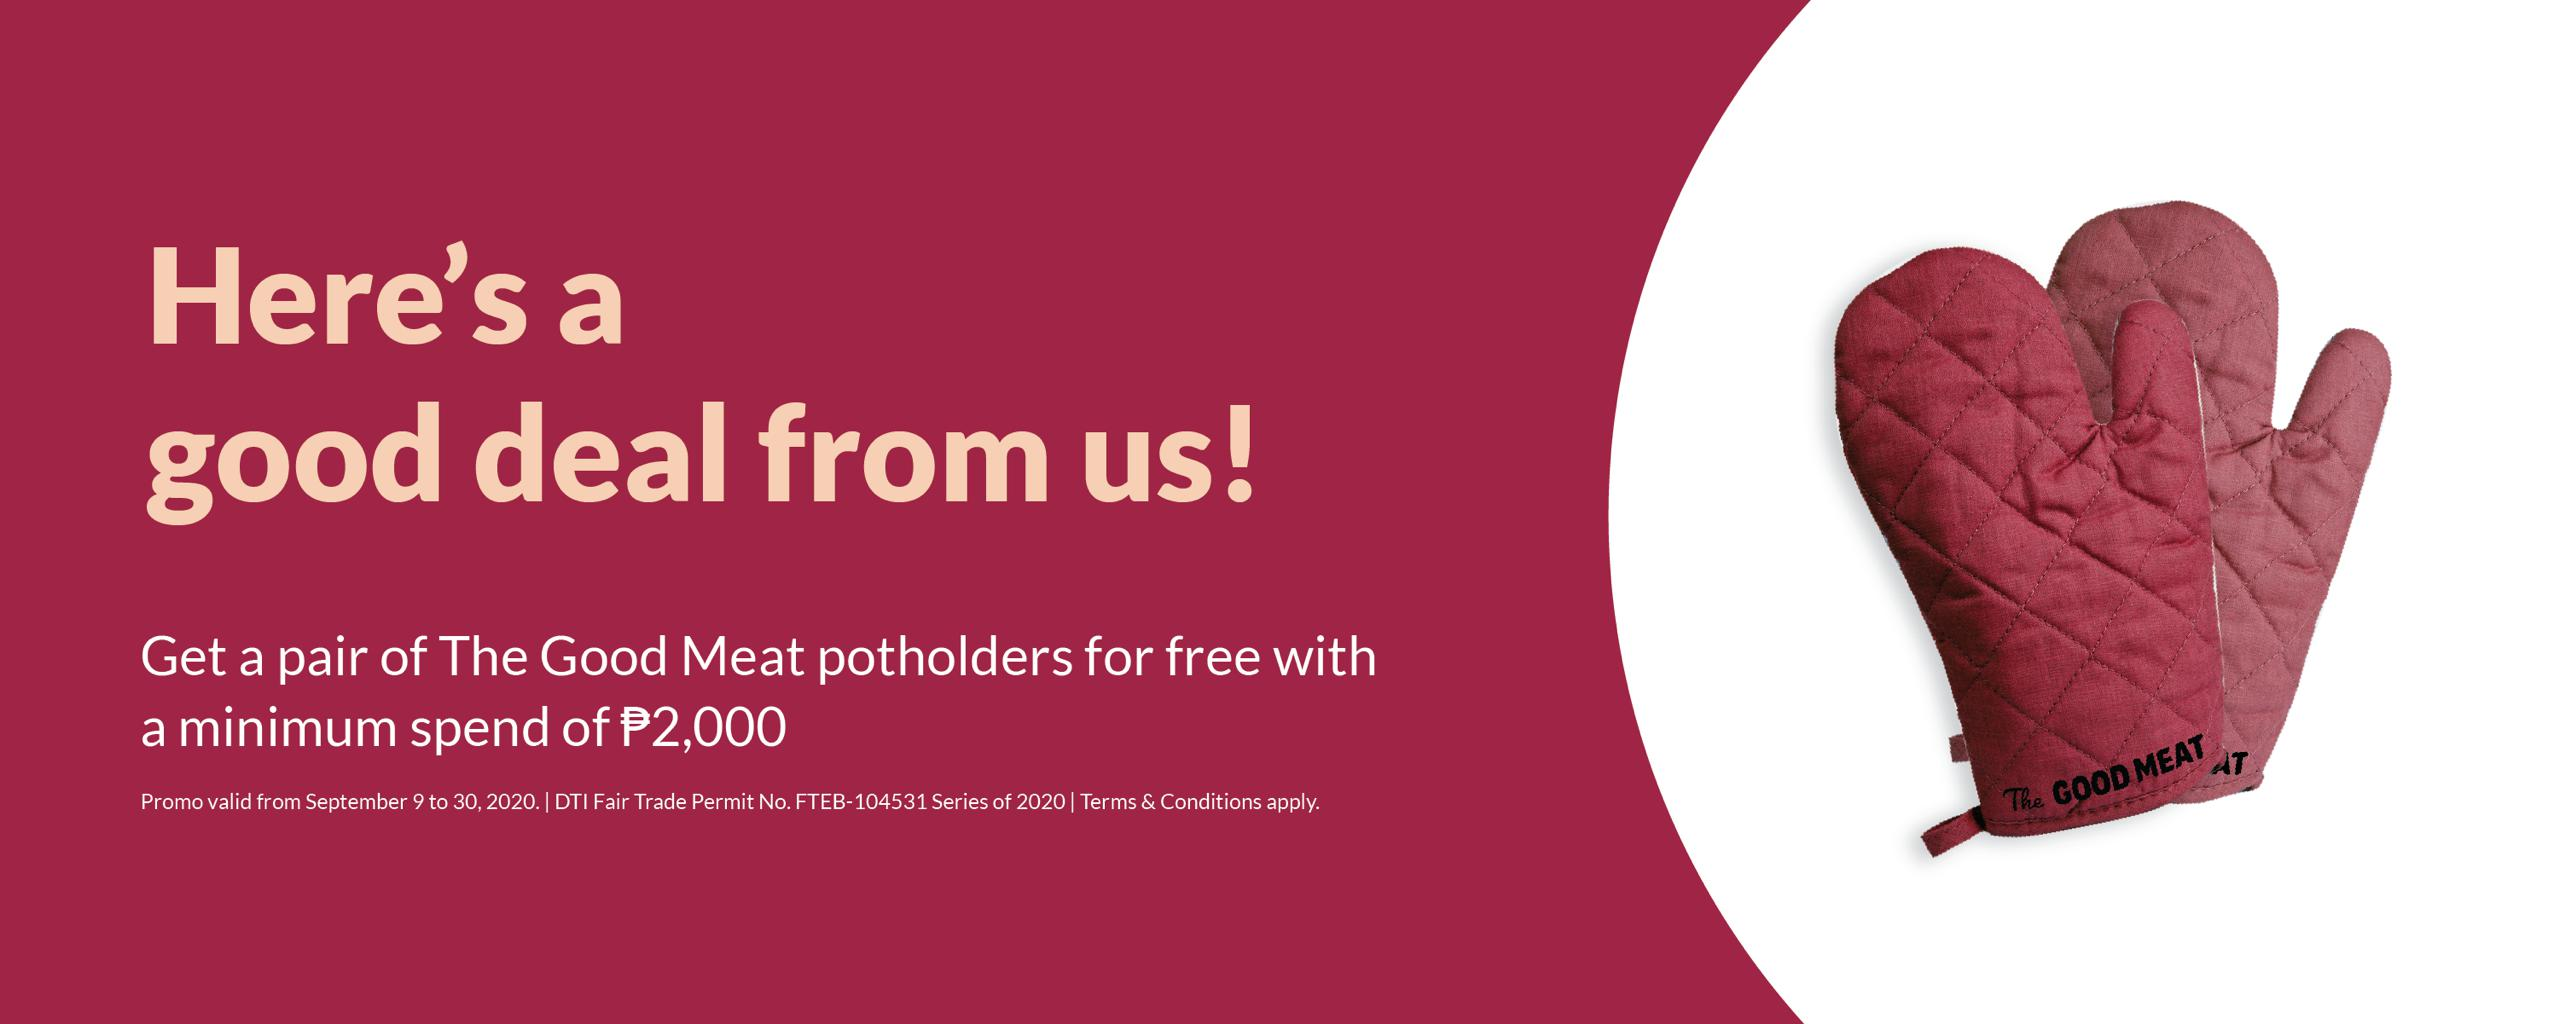 The Good Meat Free Potholder Promo